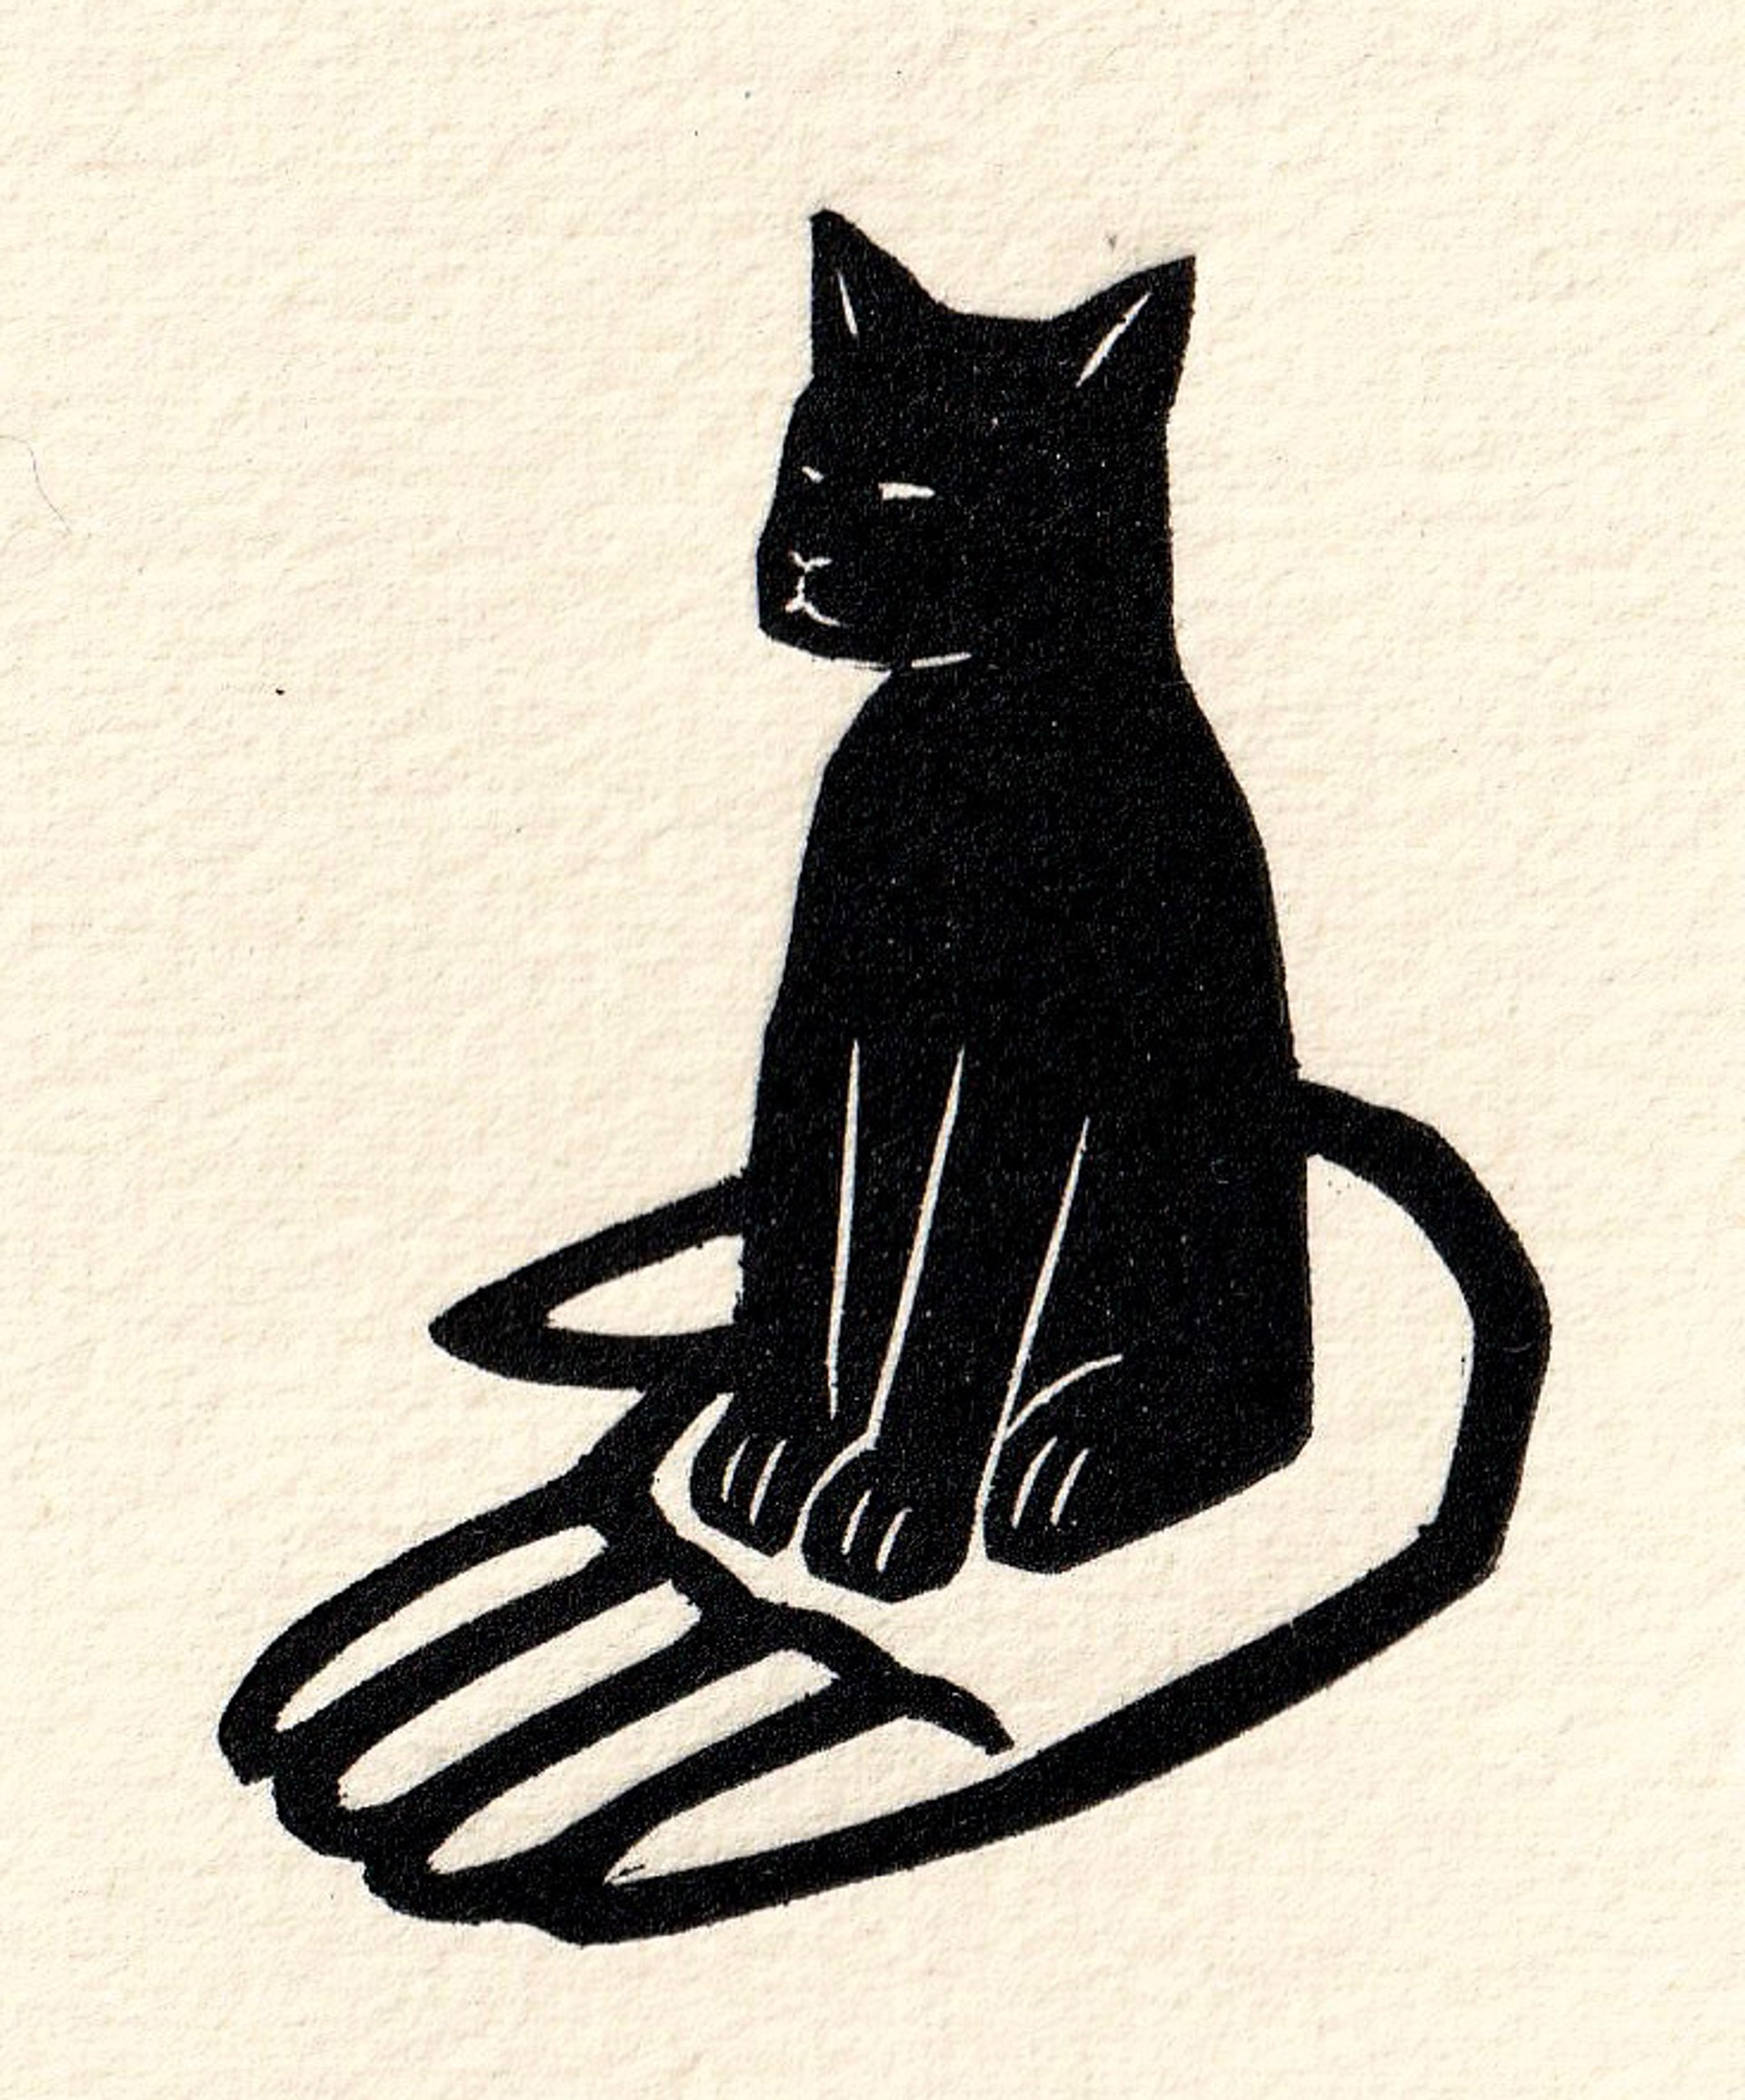 Gato Parado Mano by Alberto Cruz